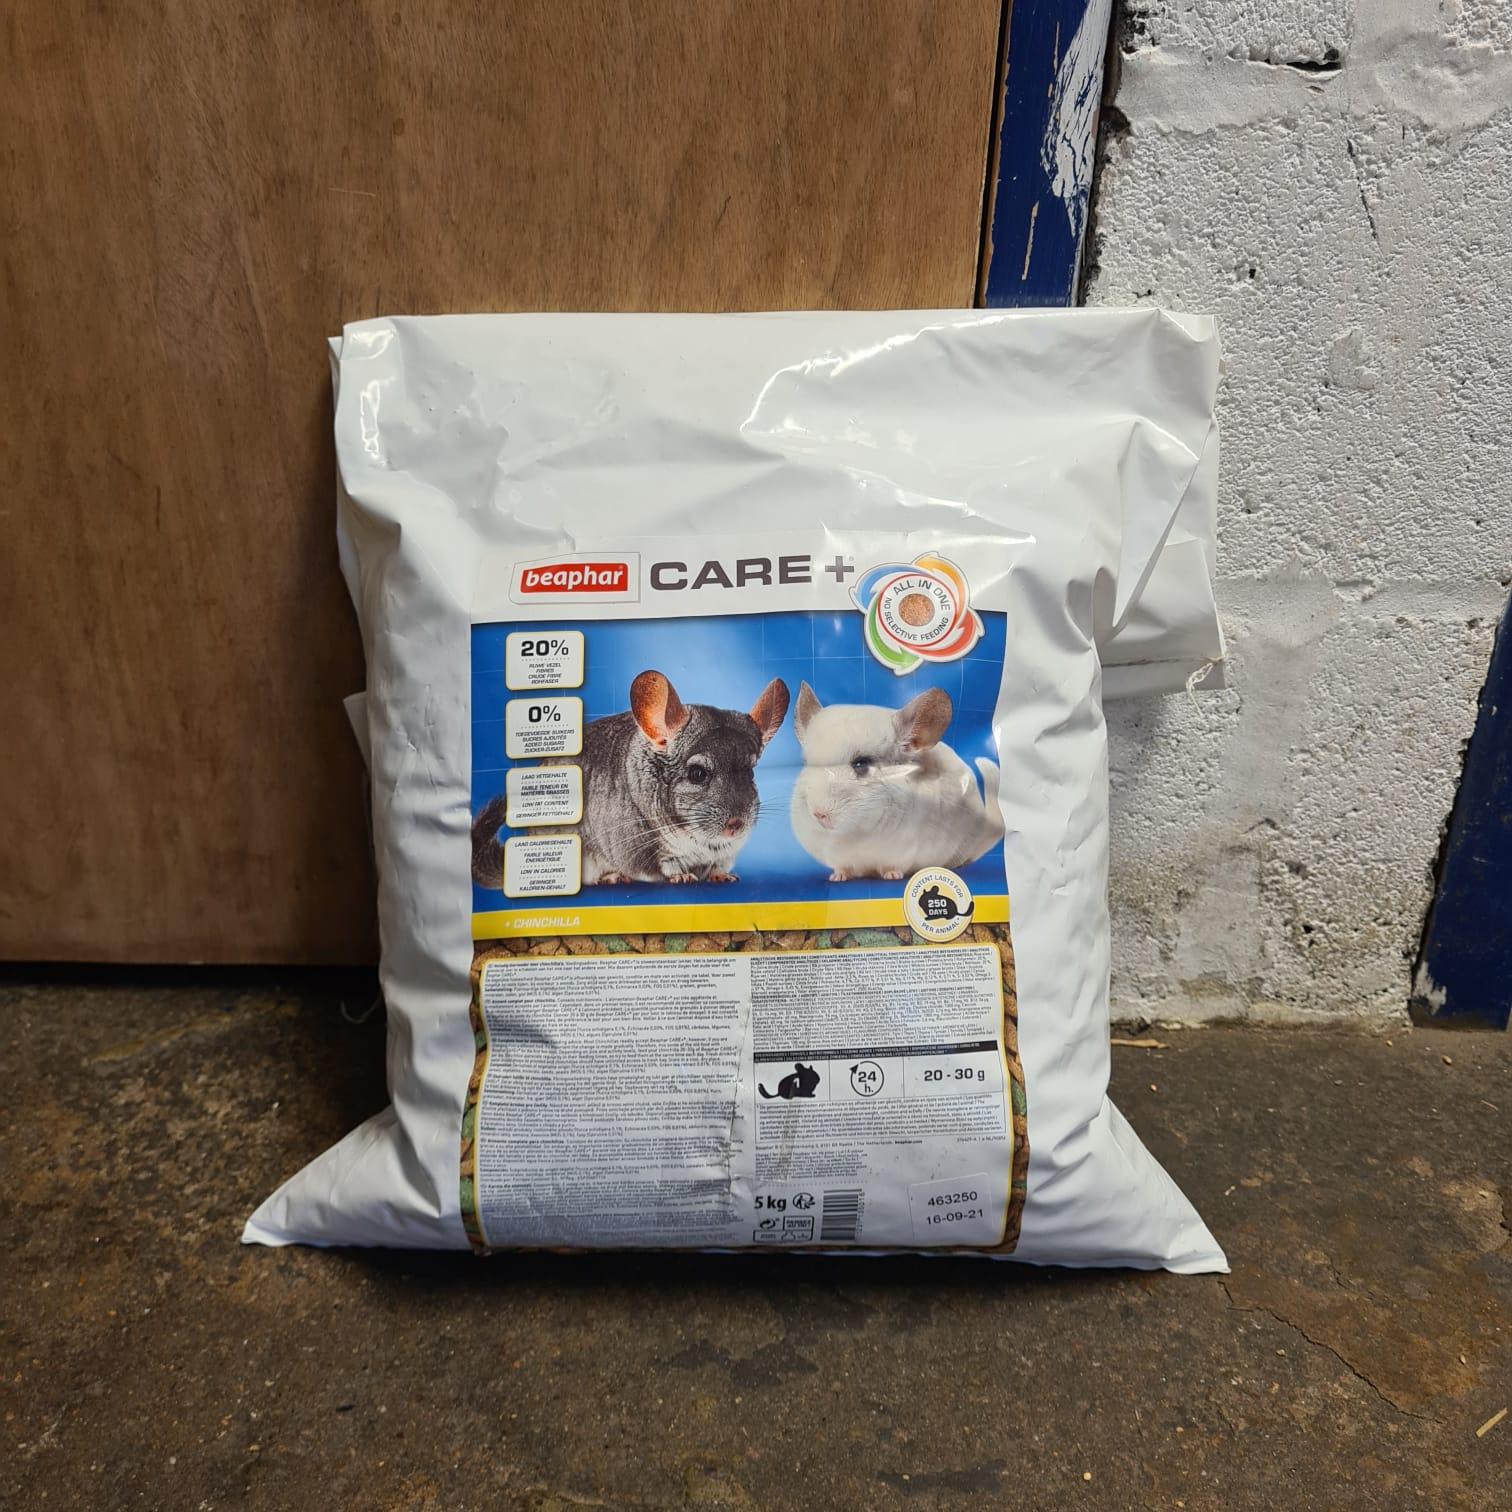 CLEARANCE BEAPHAR Care + Chinchilla Food 5kg (TORN BAG – RESEALED)